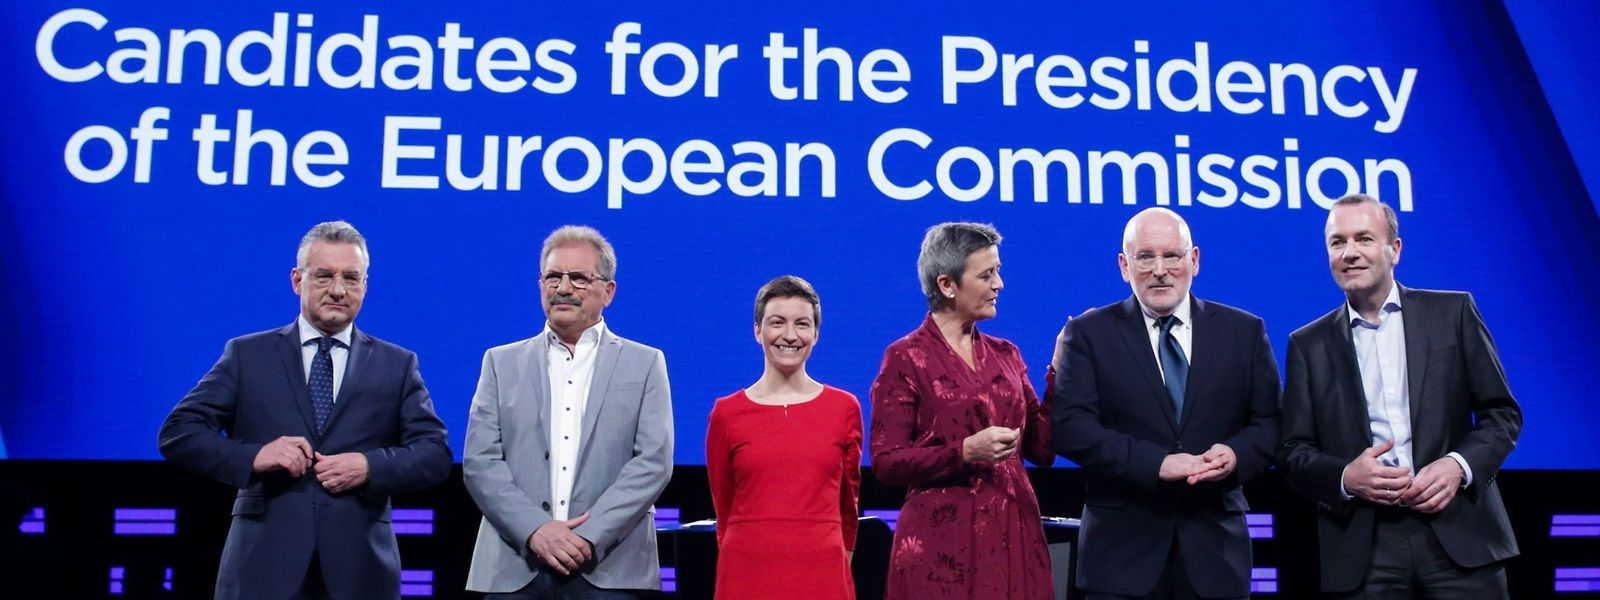 De gauche à droite: Jan Zahradil, Nico Cue, Ska Keller, Margrethe Vestager, Frans Timmermans et Manfred Weber